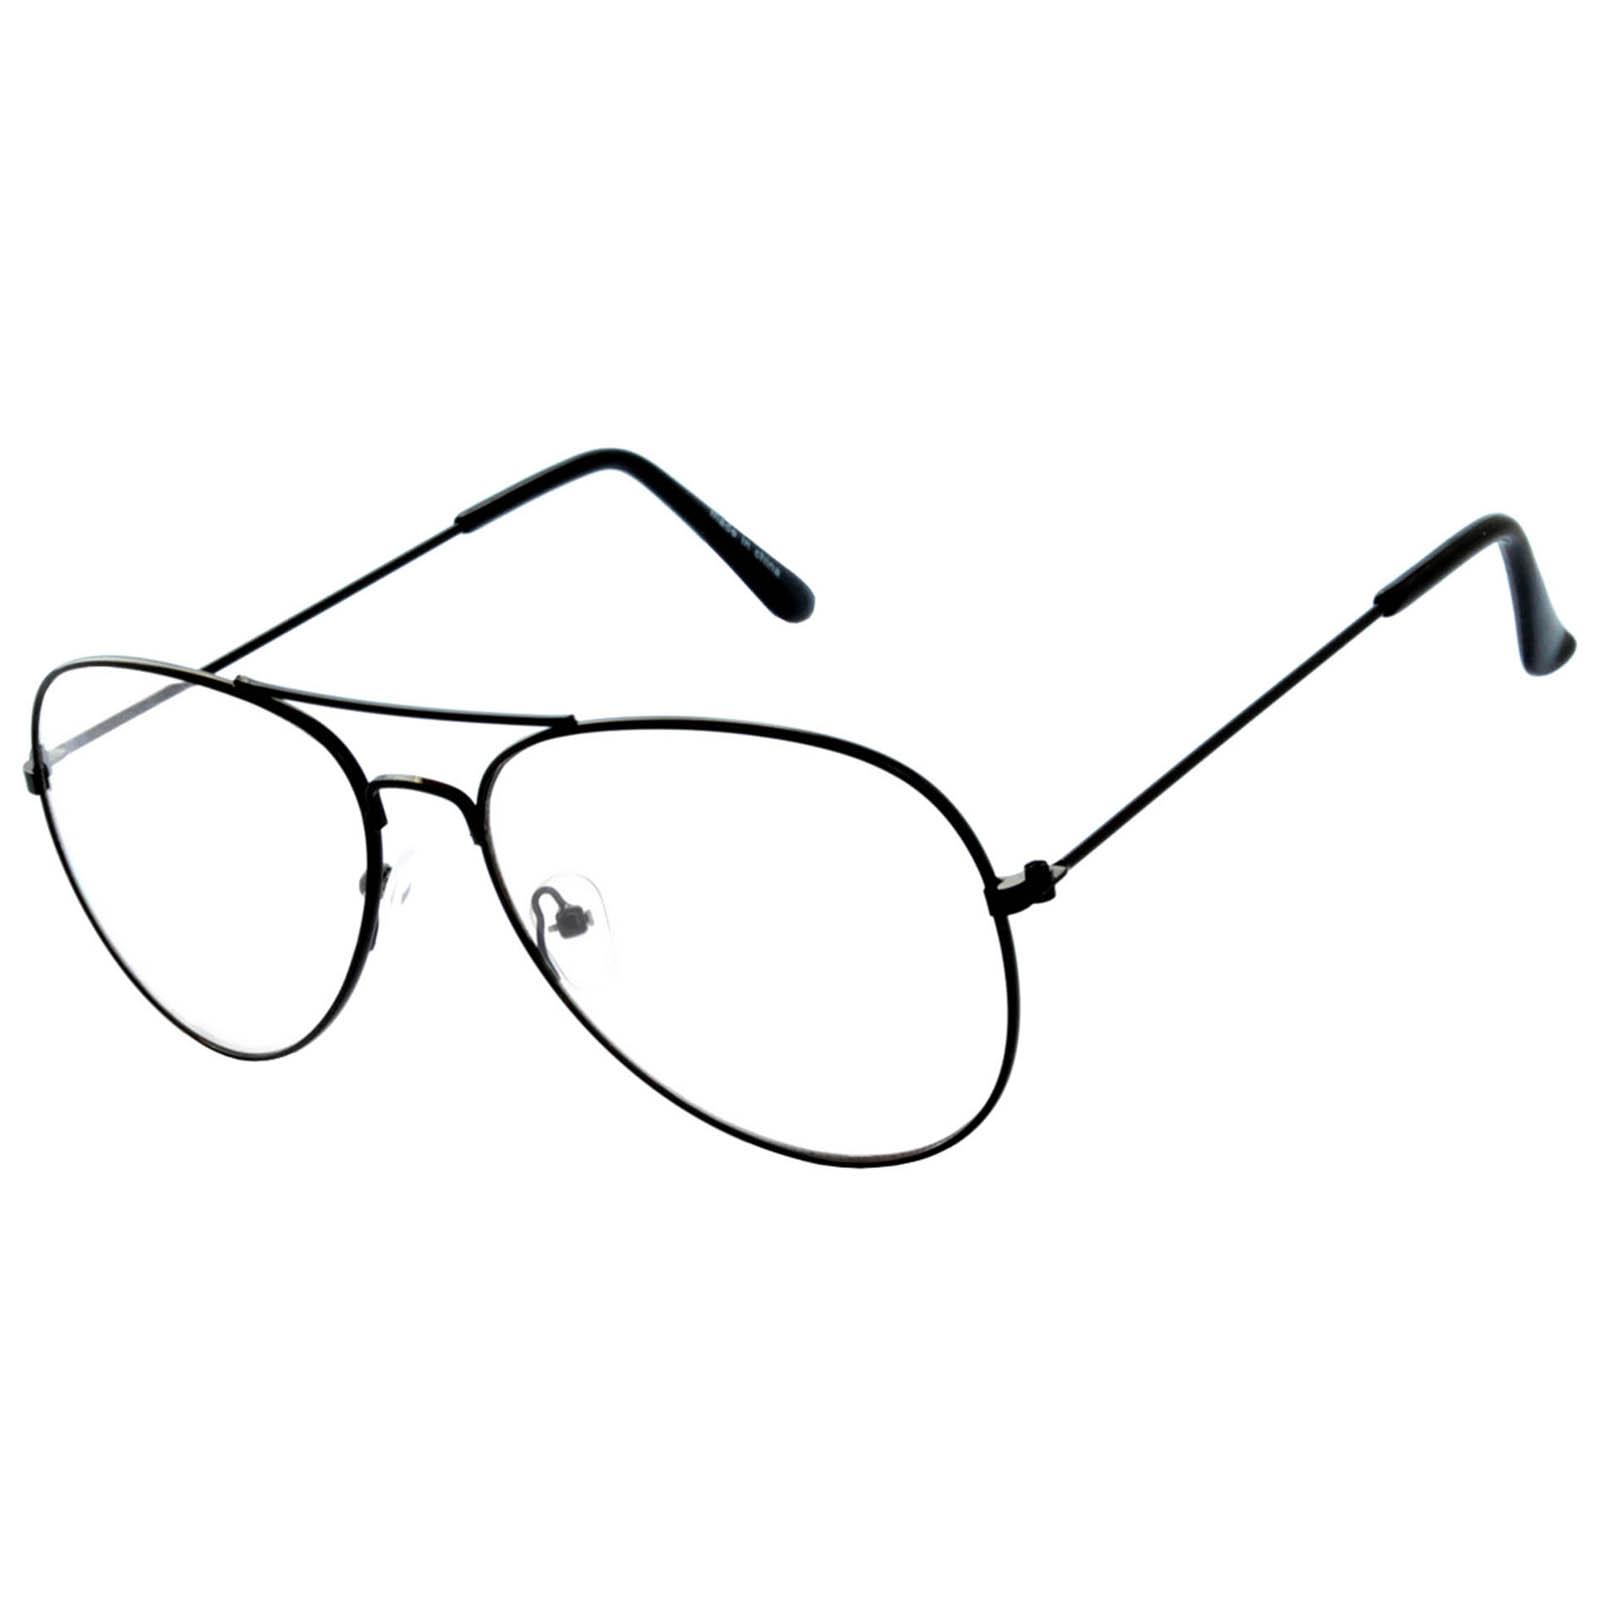 54ca8d6cfd0 OWL ® Eyewear Sunglasses Metal Fashion Aviator Mix Frame Clear Lens ...